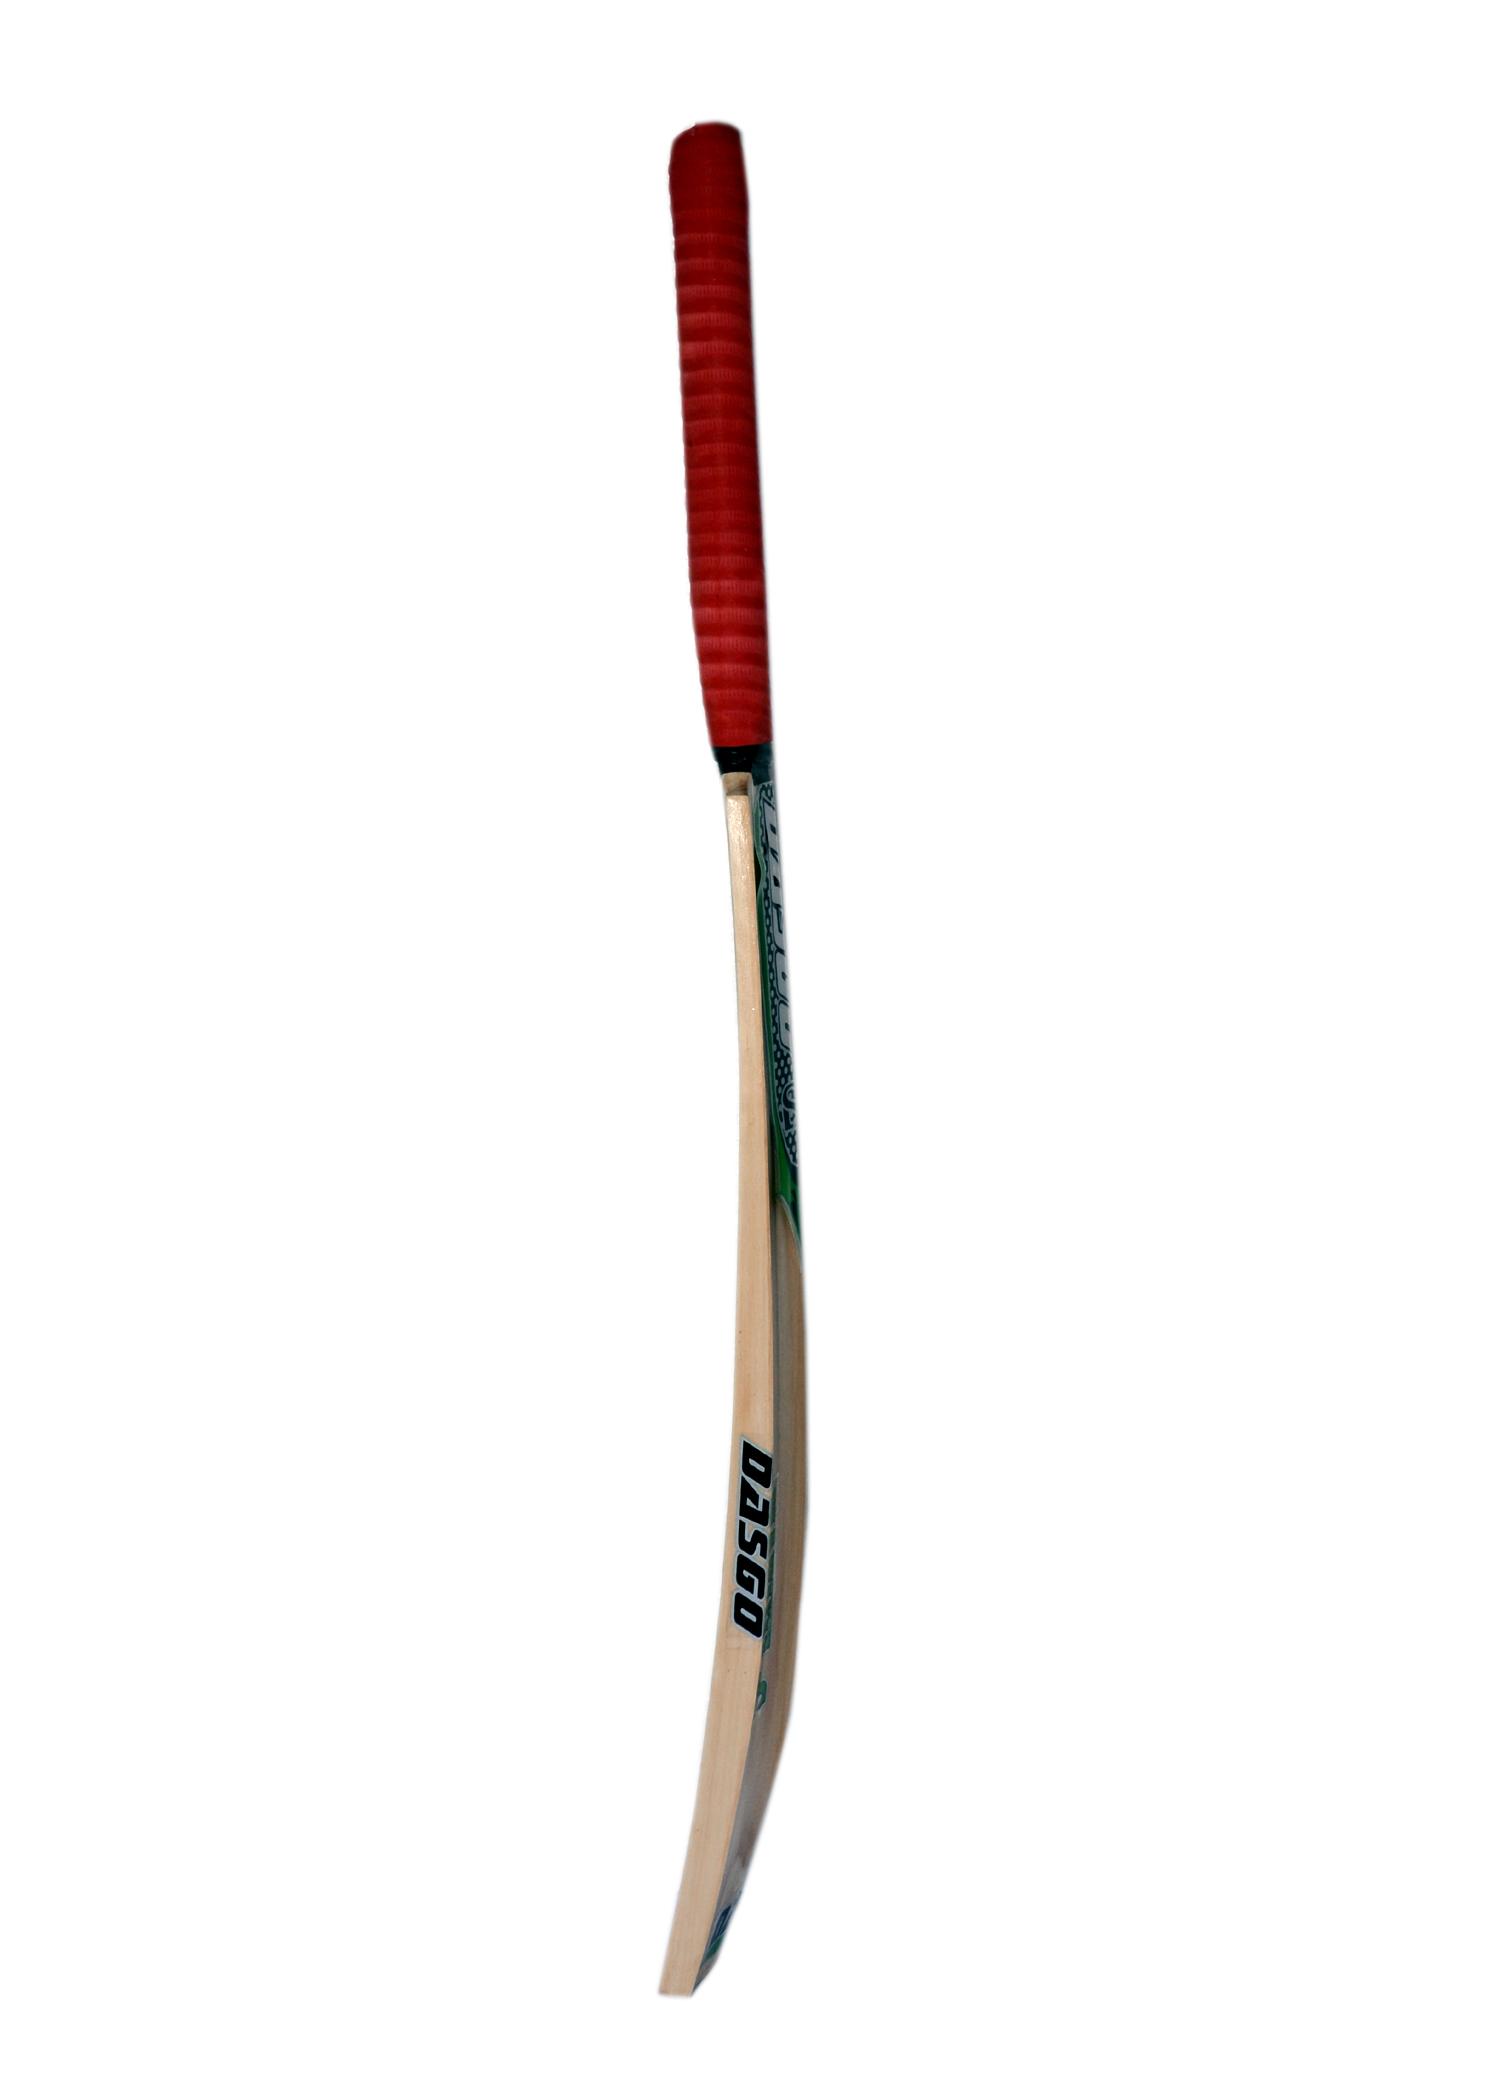 Popular Willow Cricket Bat (Maruti)